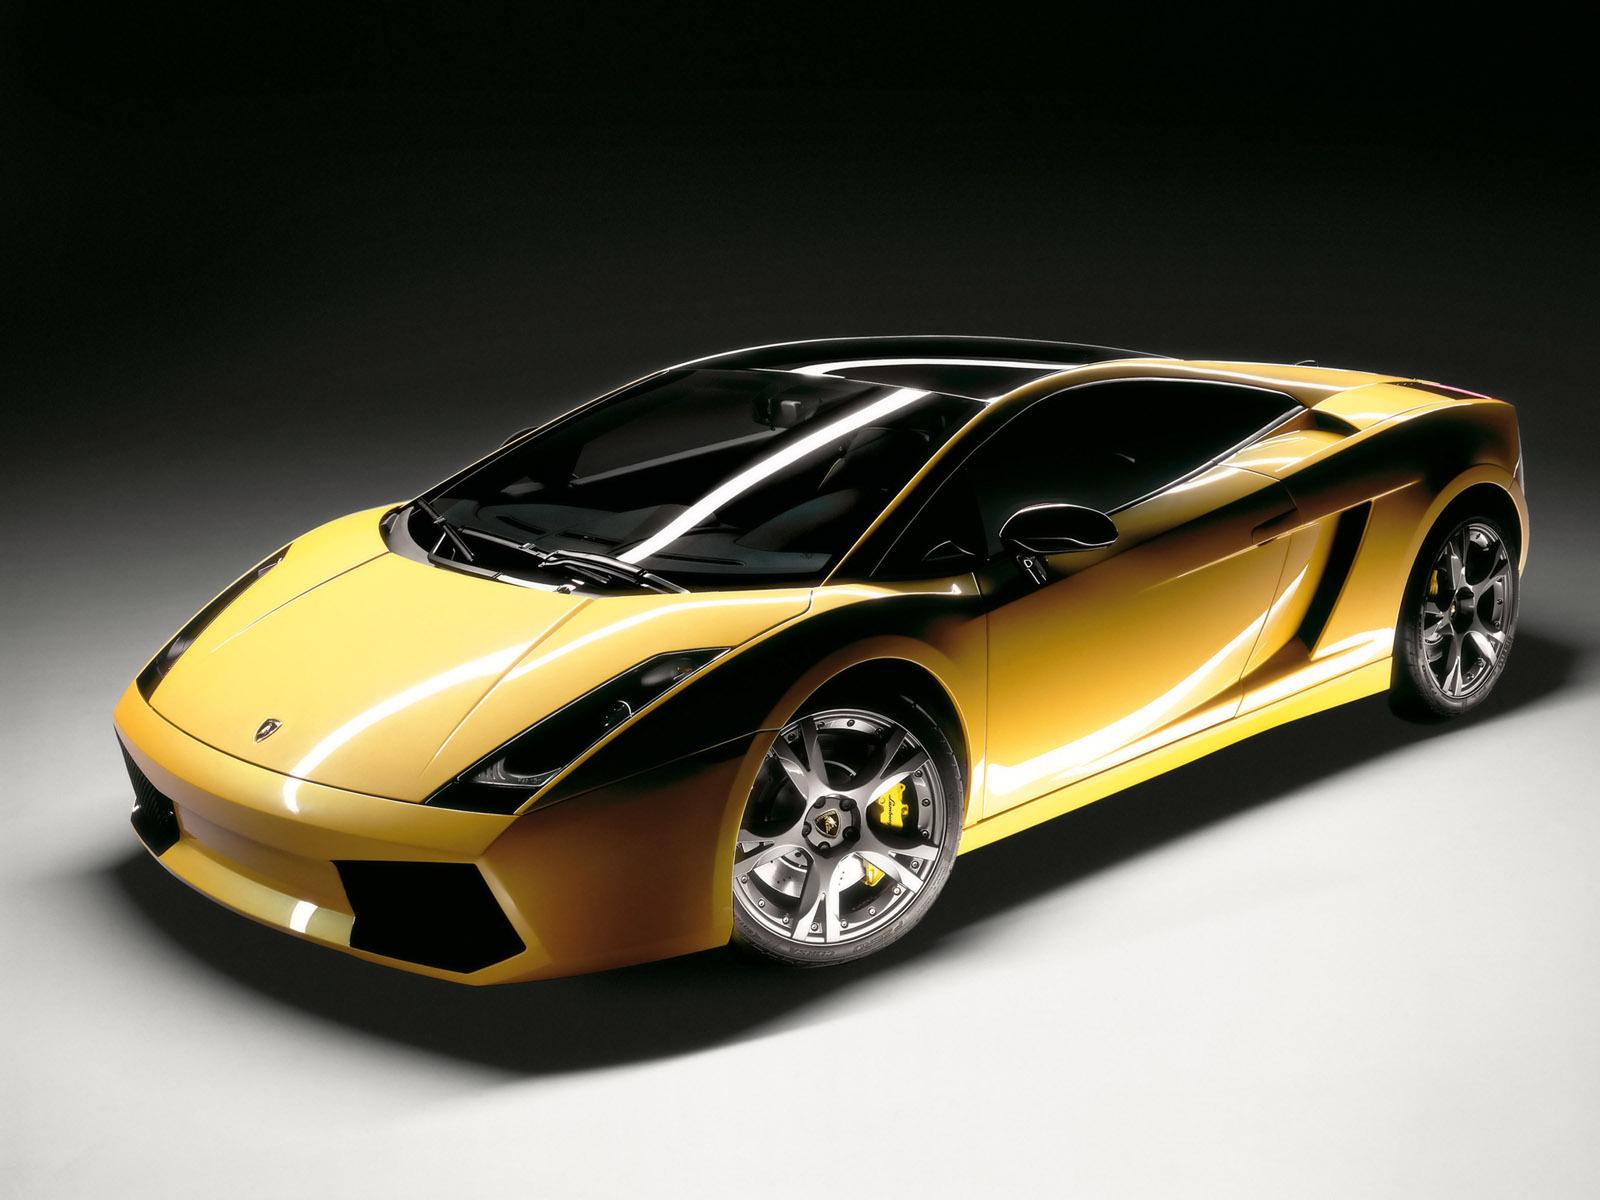 lamborghini%2Bgallardo%2Bwallpapers%2Bby%2Bcool%2Bimages%2B%2525284%252529 Lamborghini Wallpaper Hd 2011